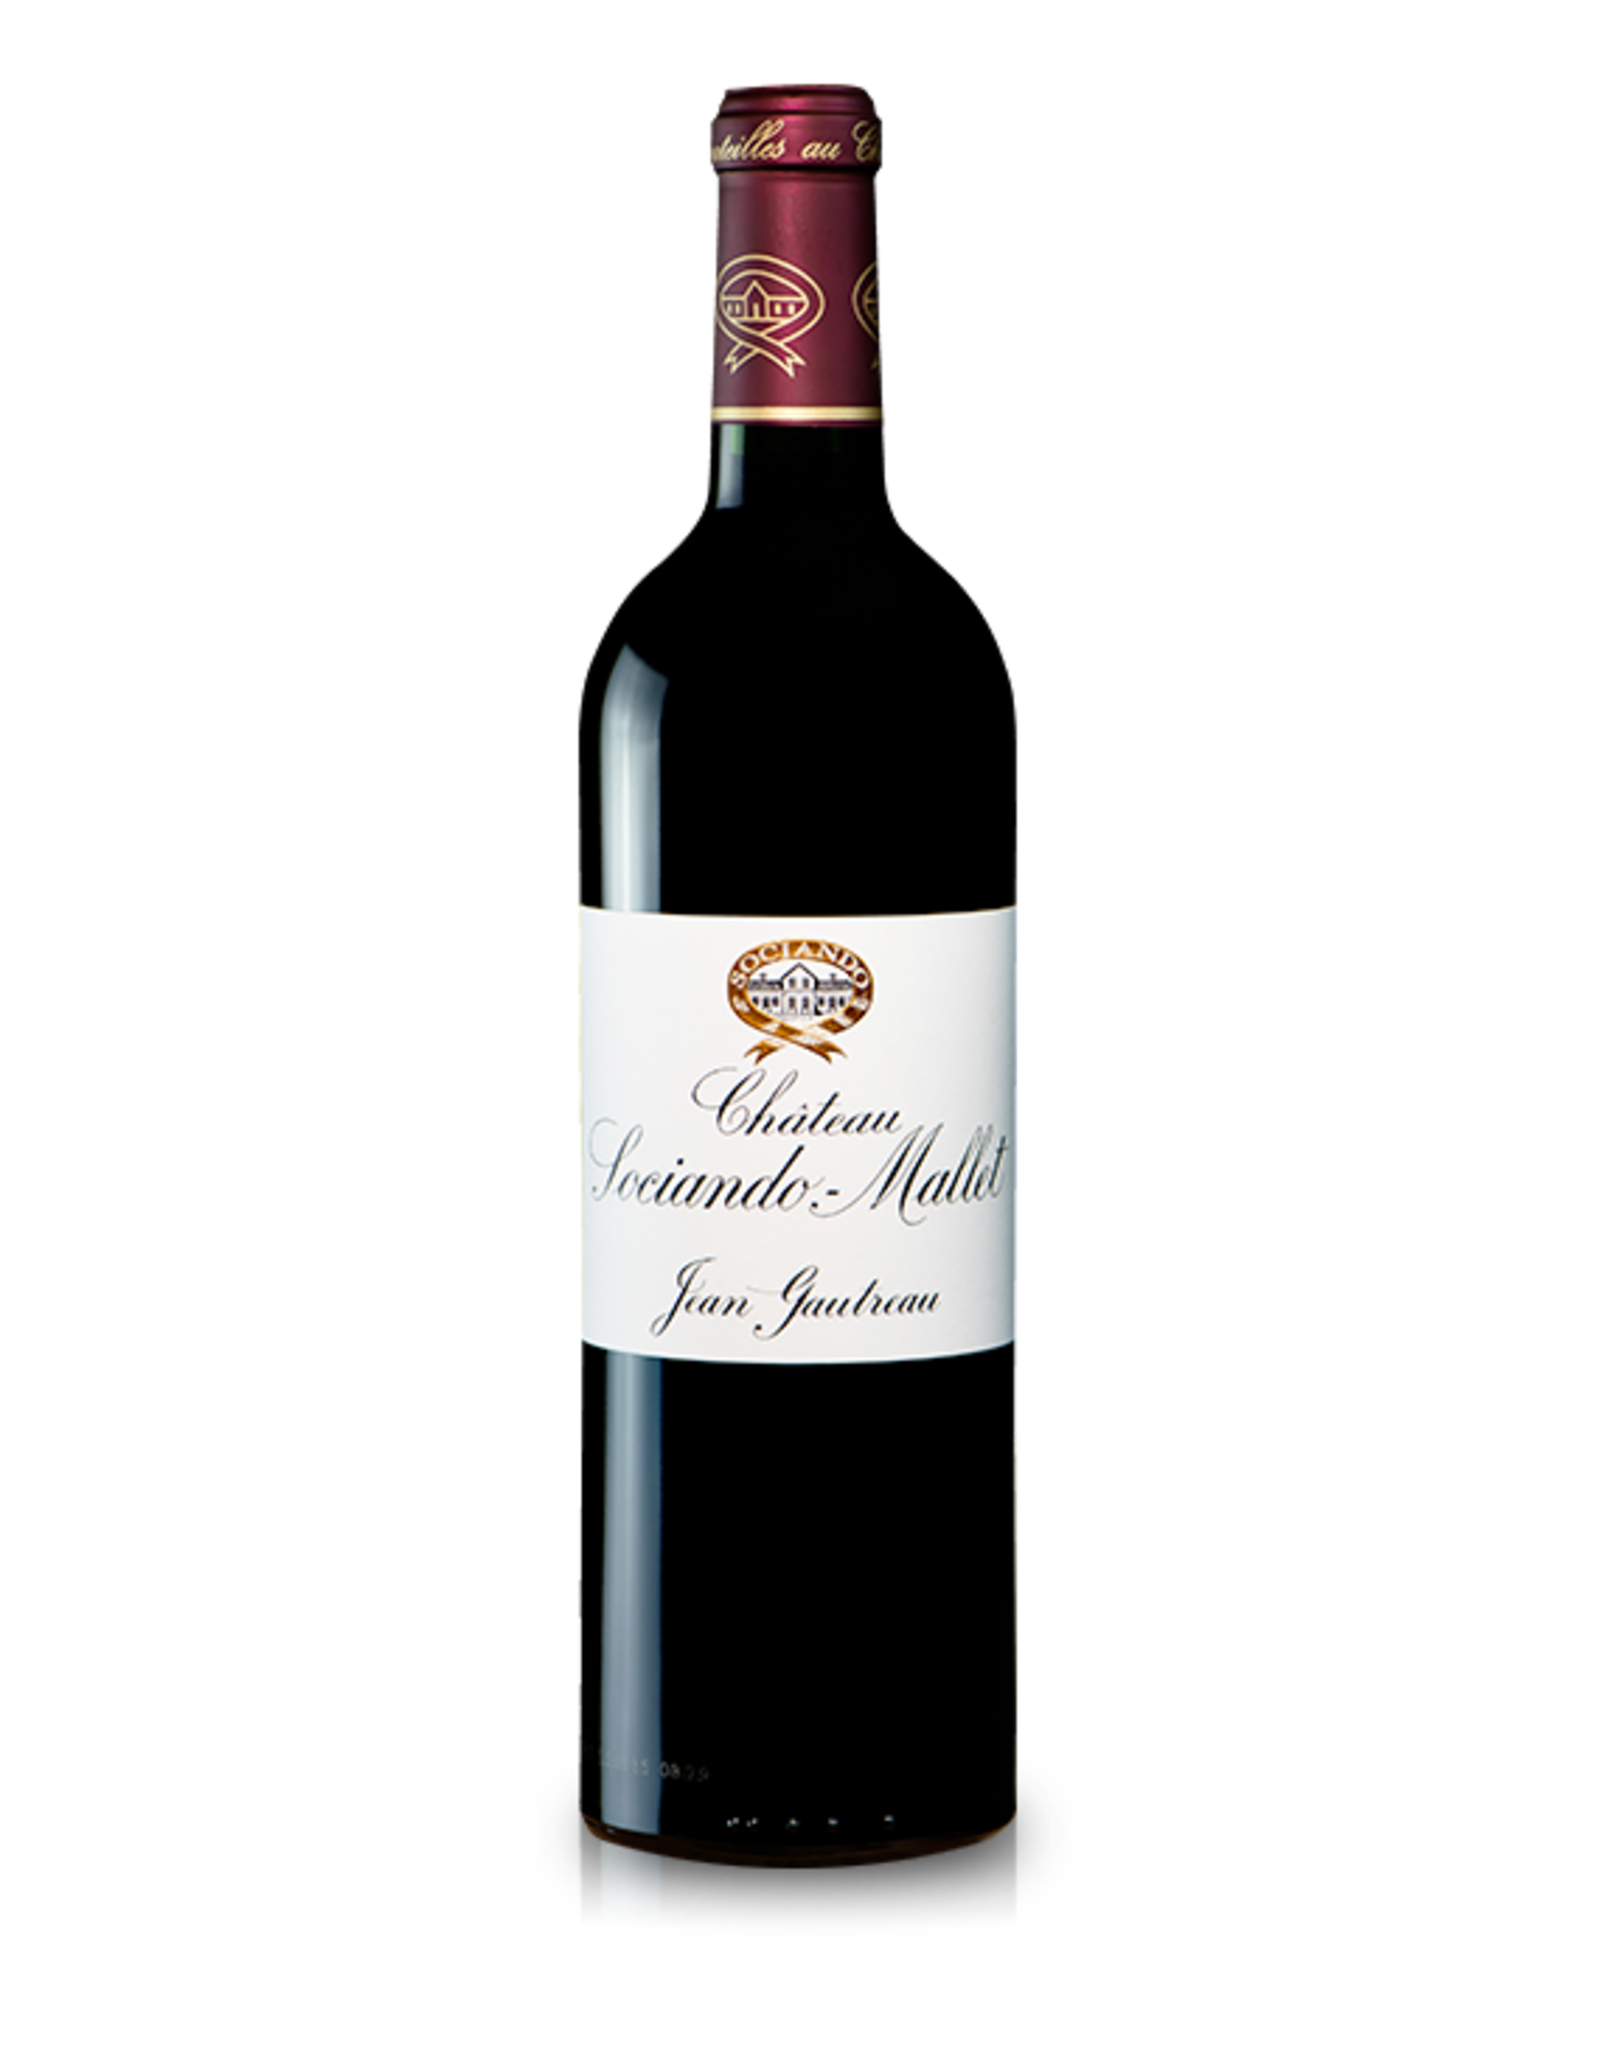 Château Sociando-Mallet Château Sociando-Mallet 2016 - Haut-Médoc